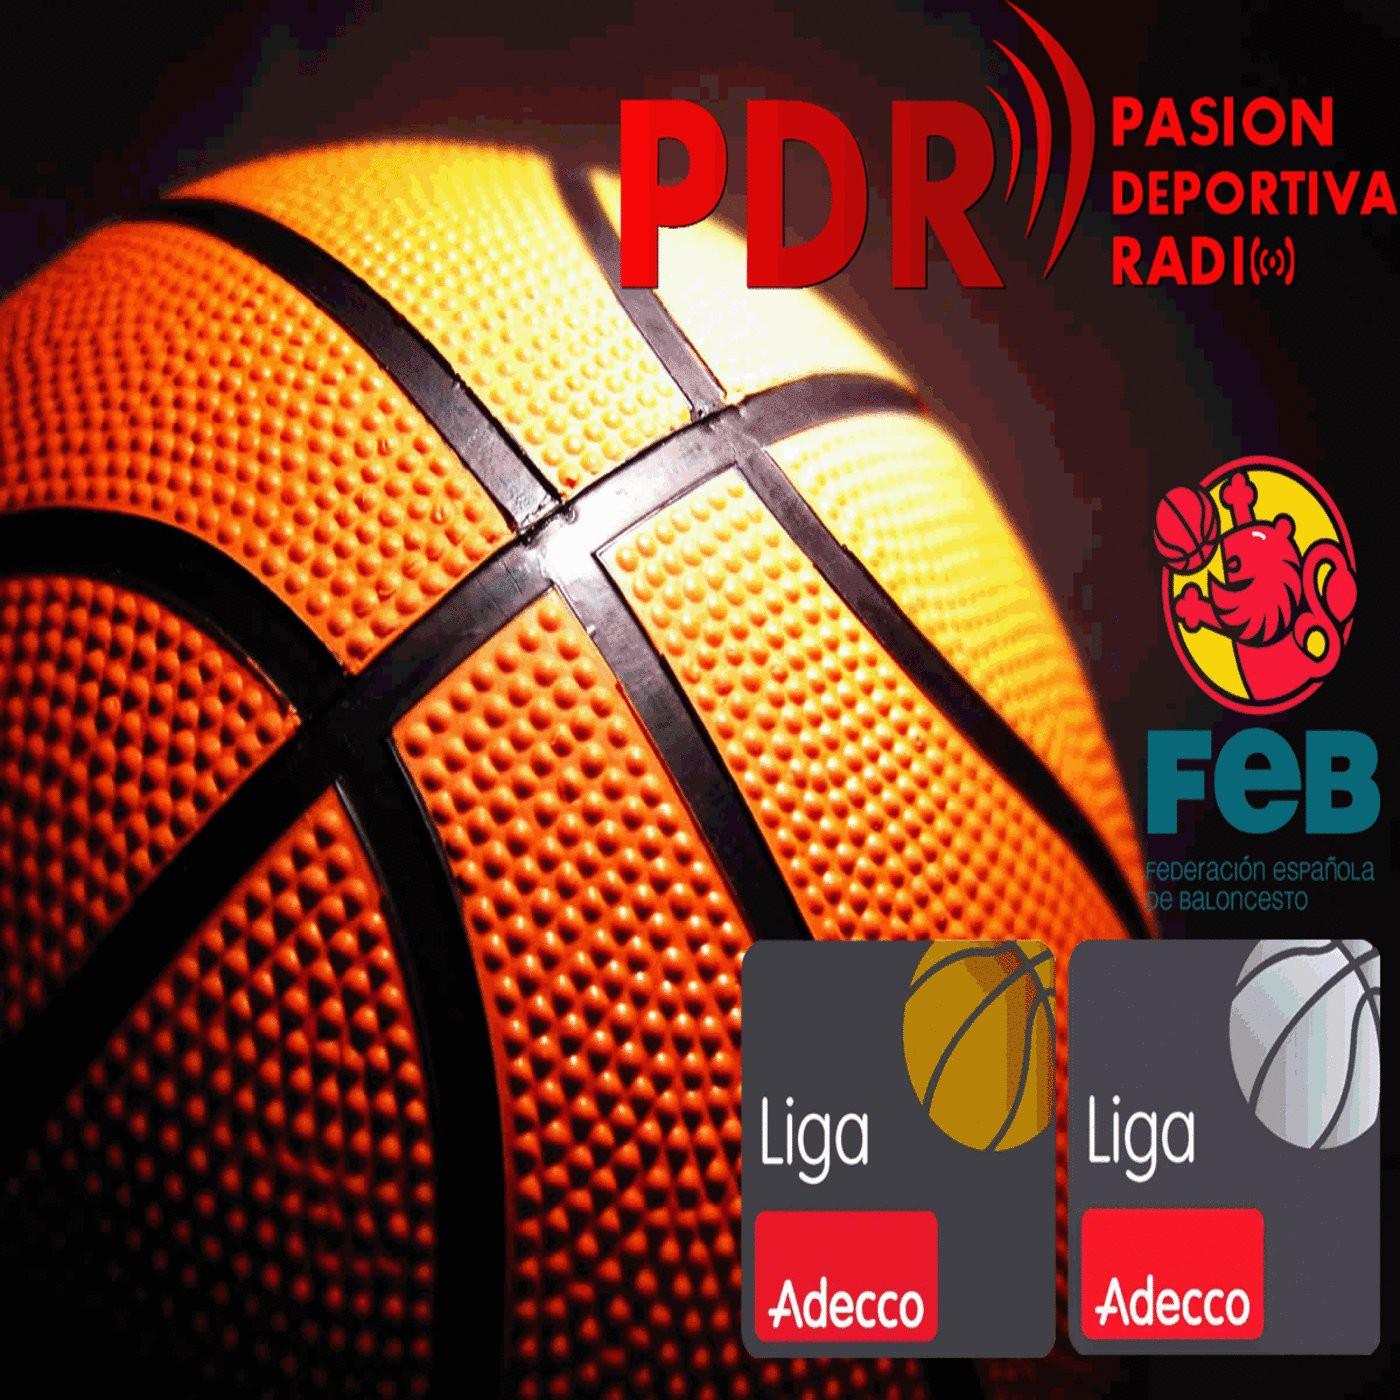 Ligas Adecco 2013-14